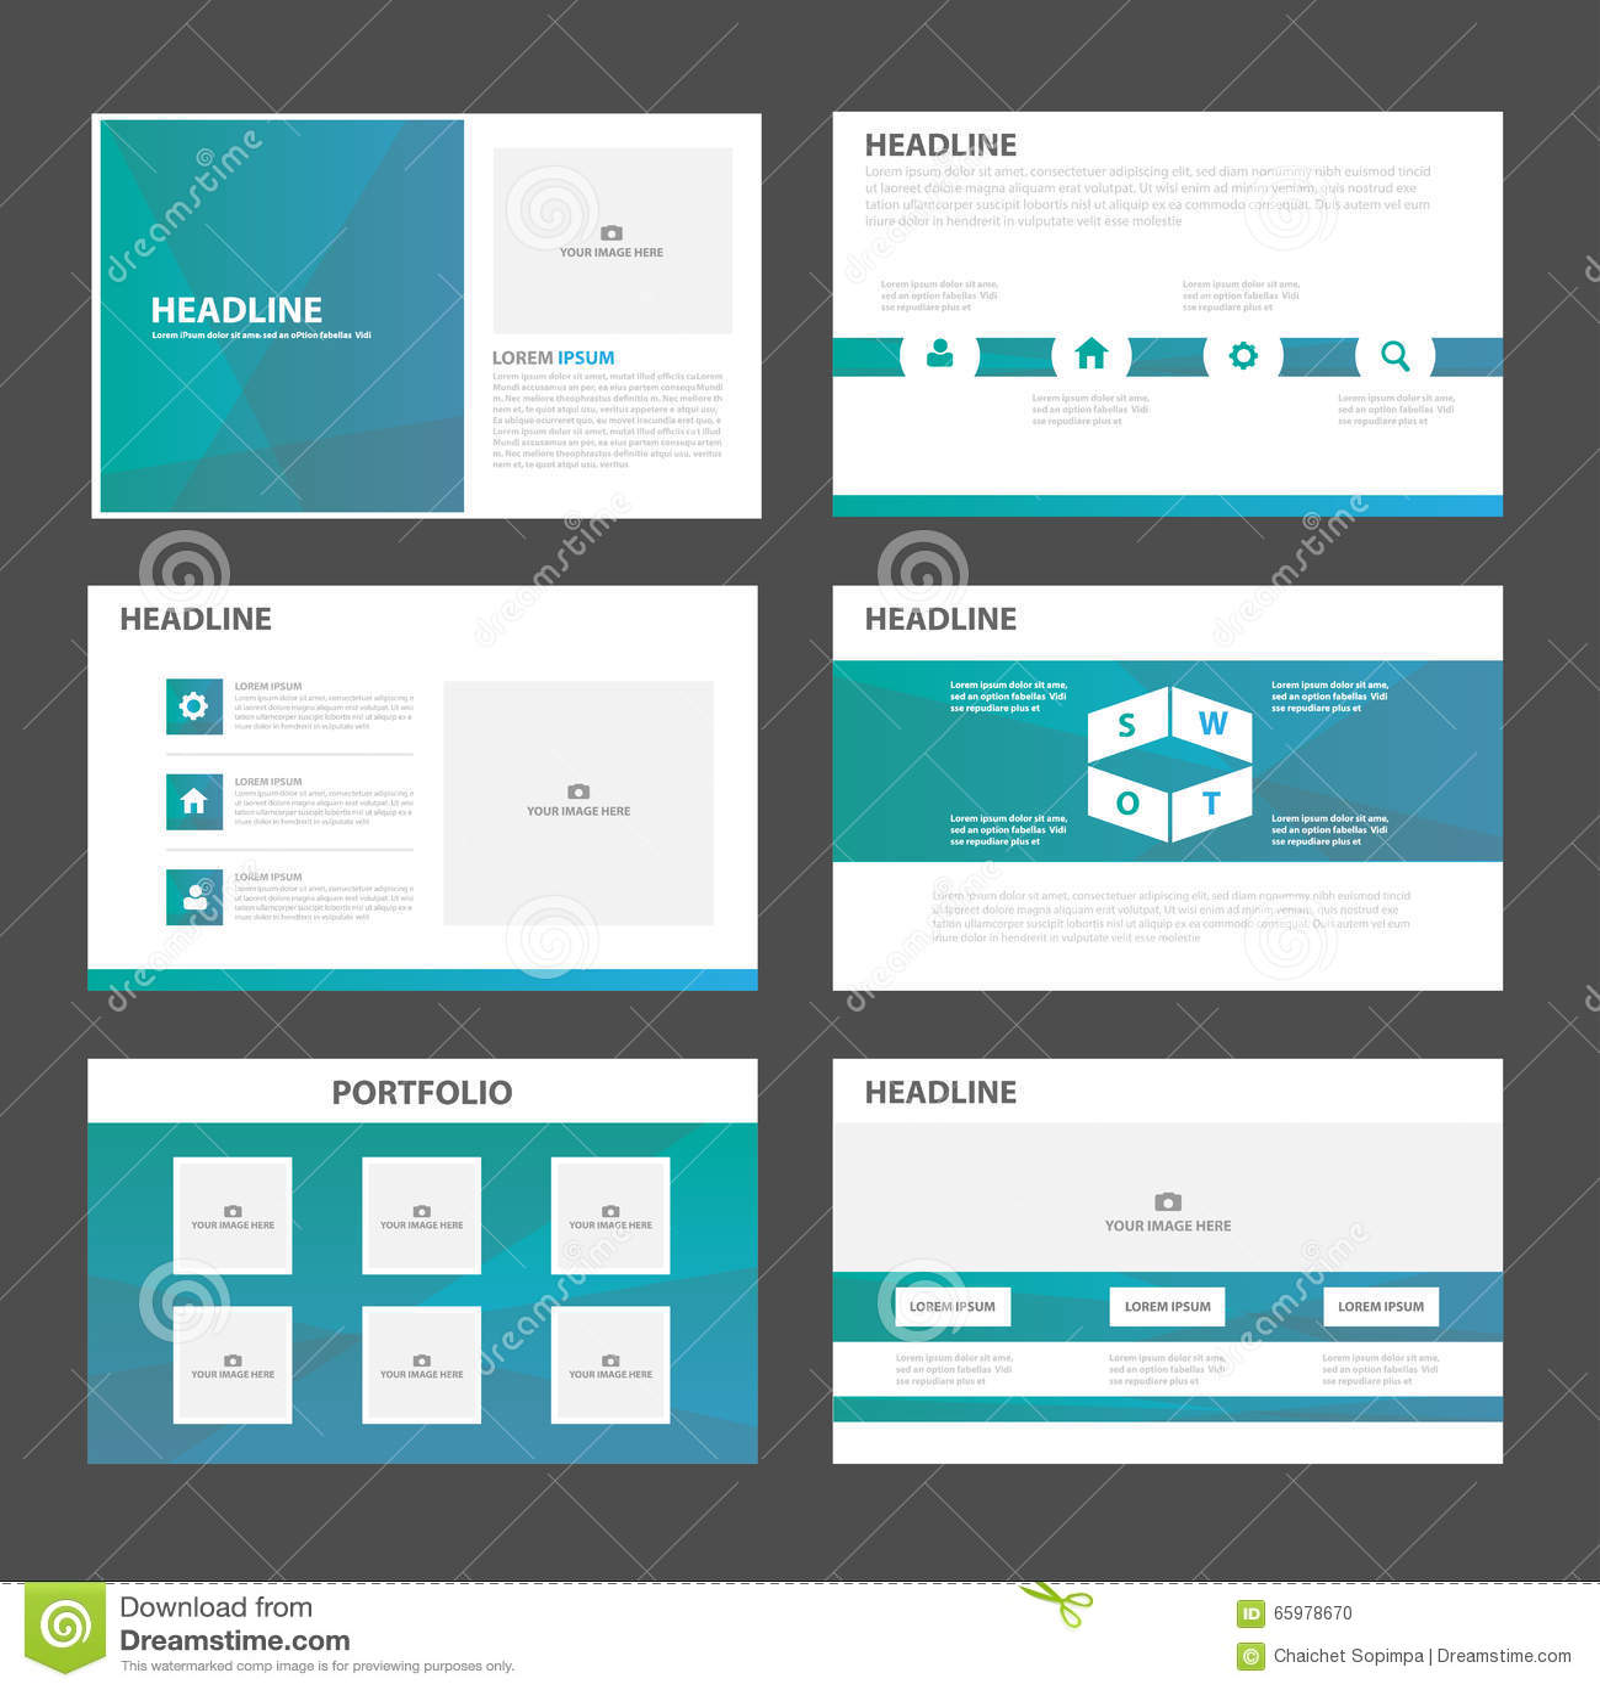 blue green polygon presentation templates infographic elements blue green polygon presentation templates infographic elements flat design set for brochure flyer leaflet marketing